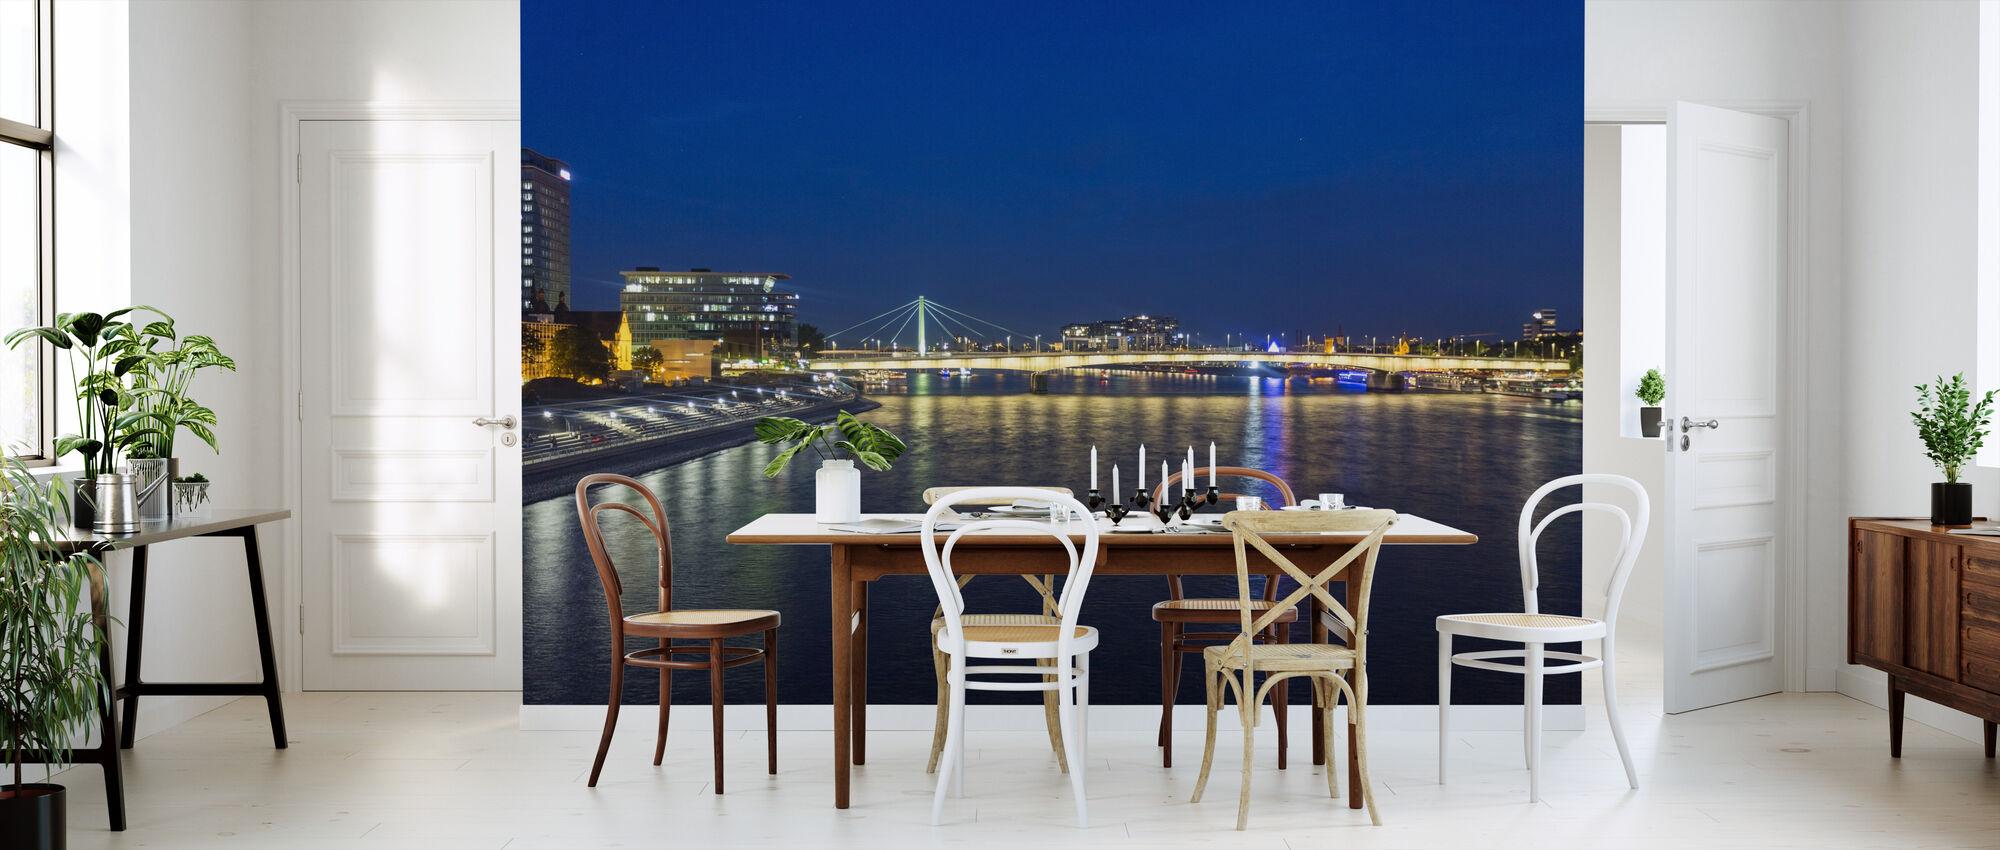 City Lights Reflection - Wallpaper - Kitchen